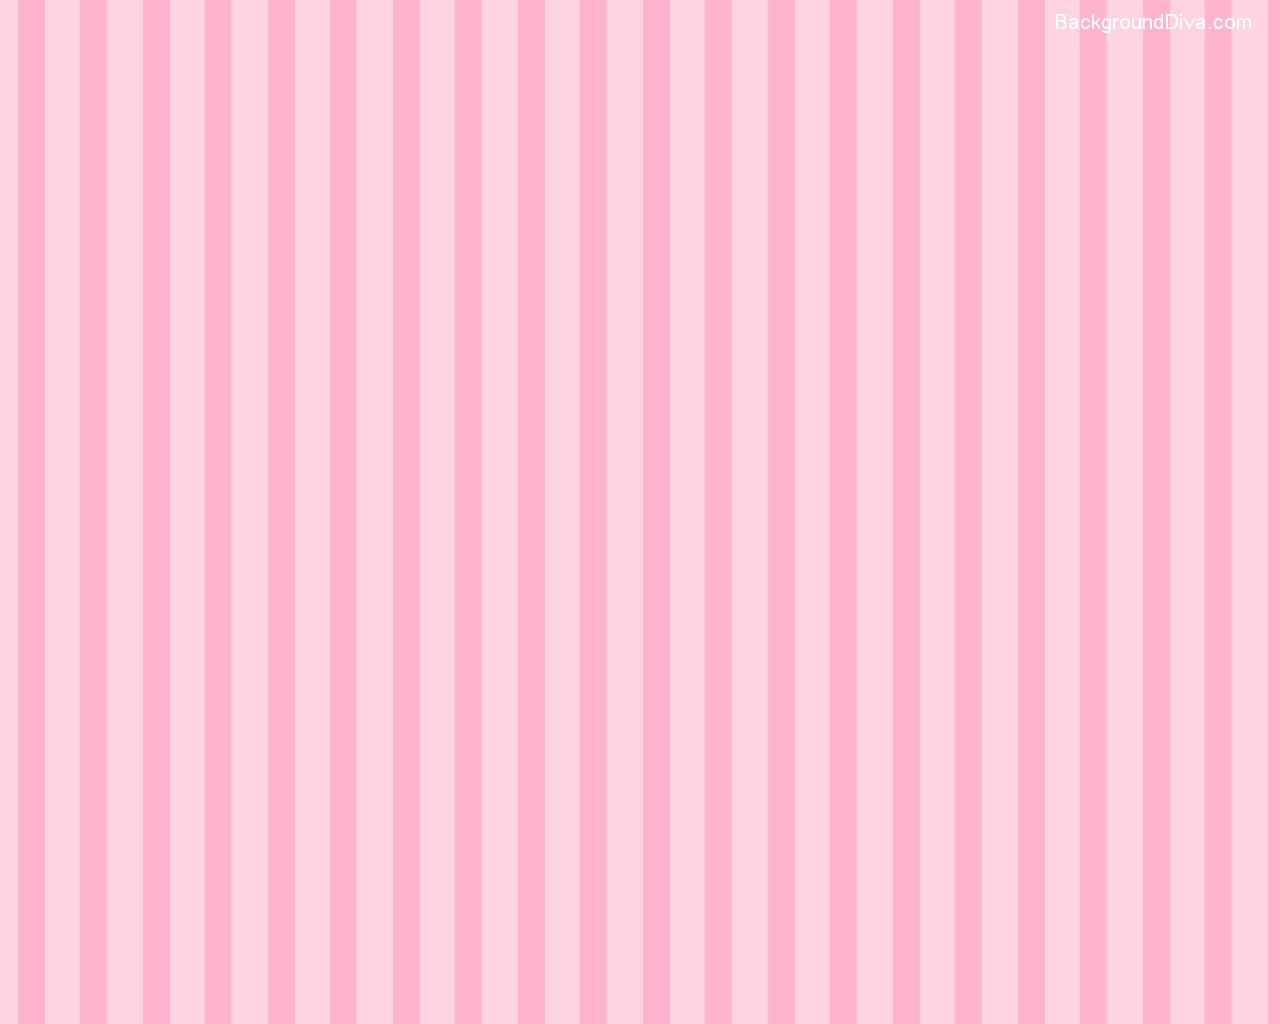 pink pattern wallpaper love wallpaper pinterest pink